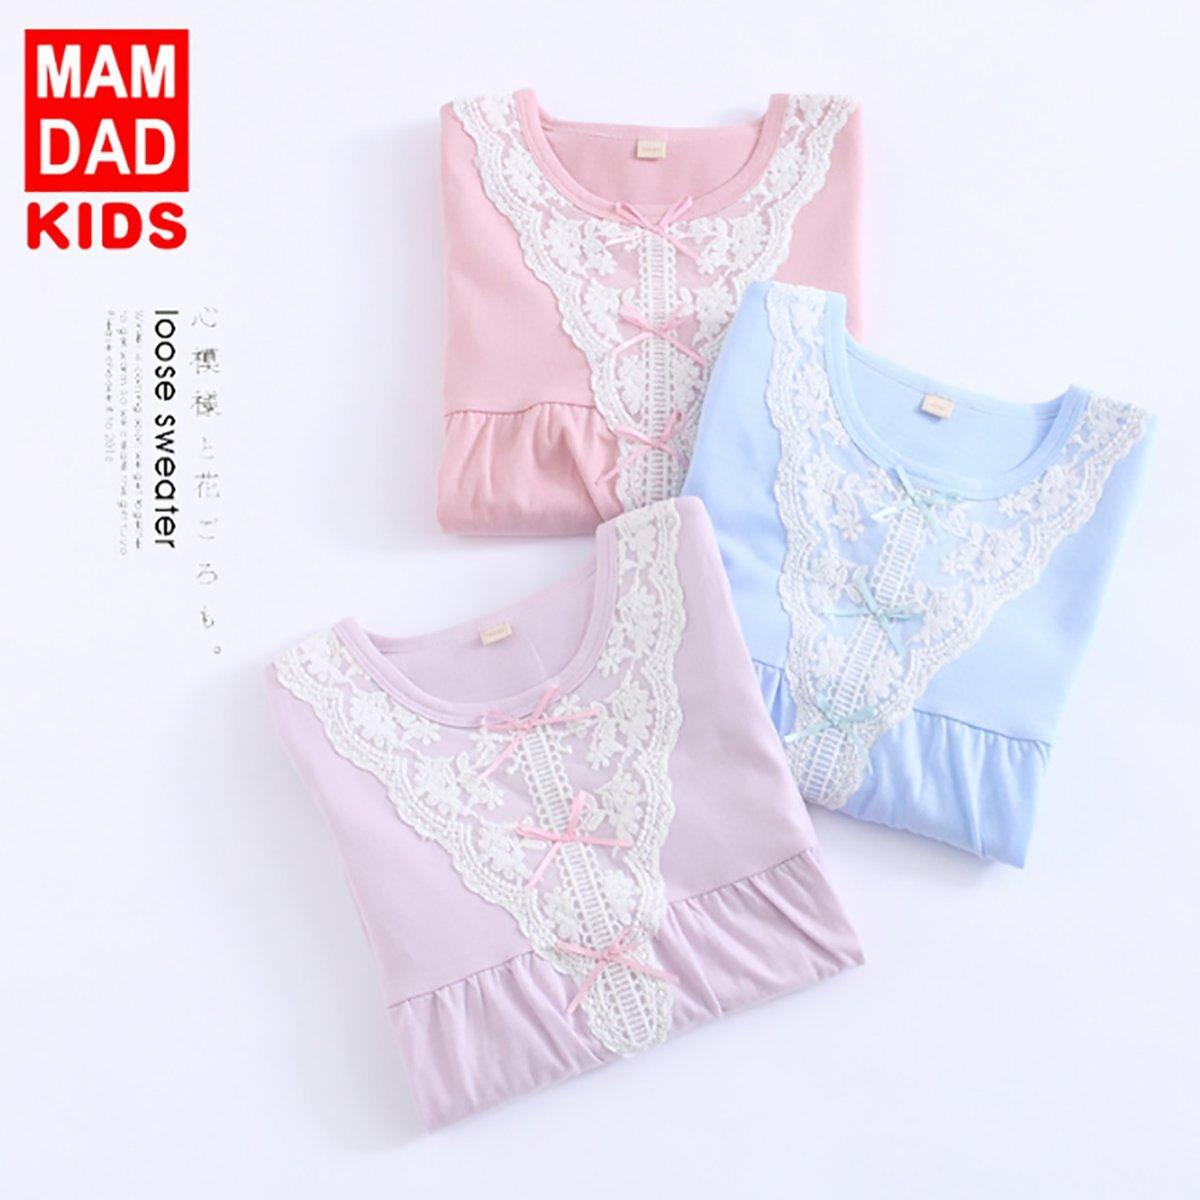 DGAGA Kids Girls Cotton Lace Nightgown Bowknot Sleepwear Solid Pajama Nightshirt